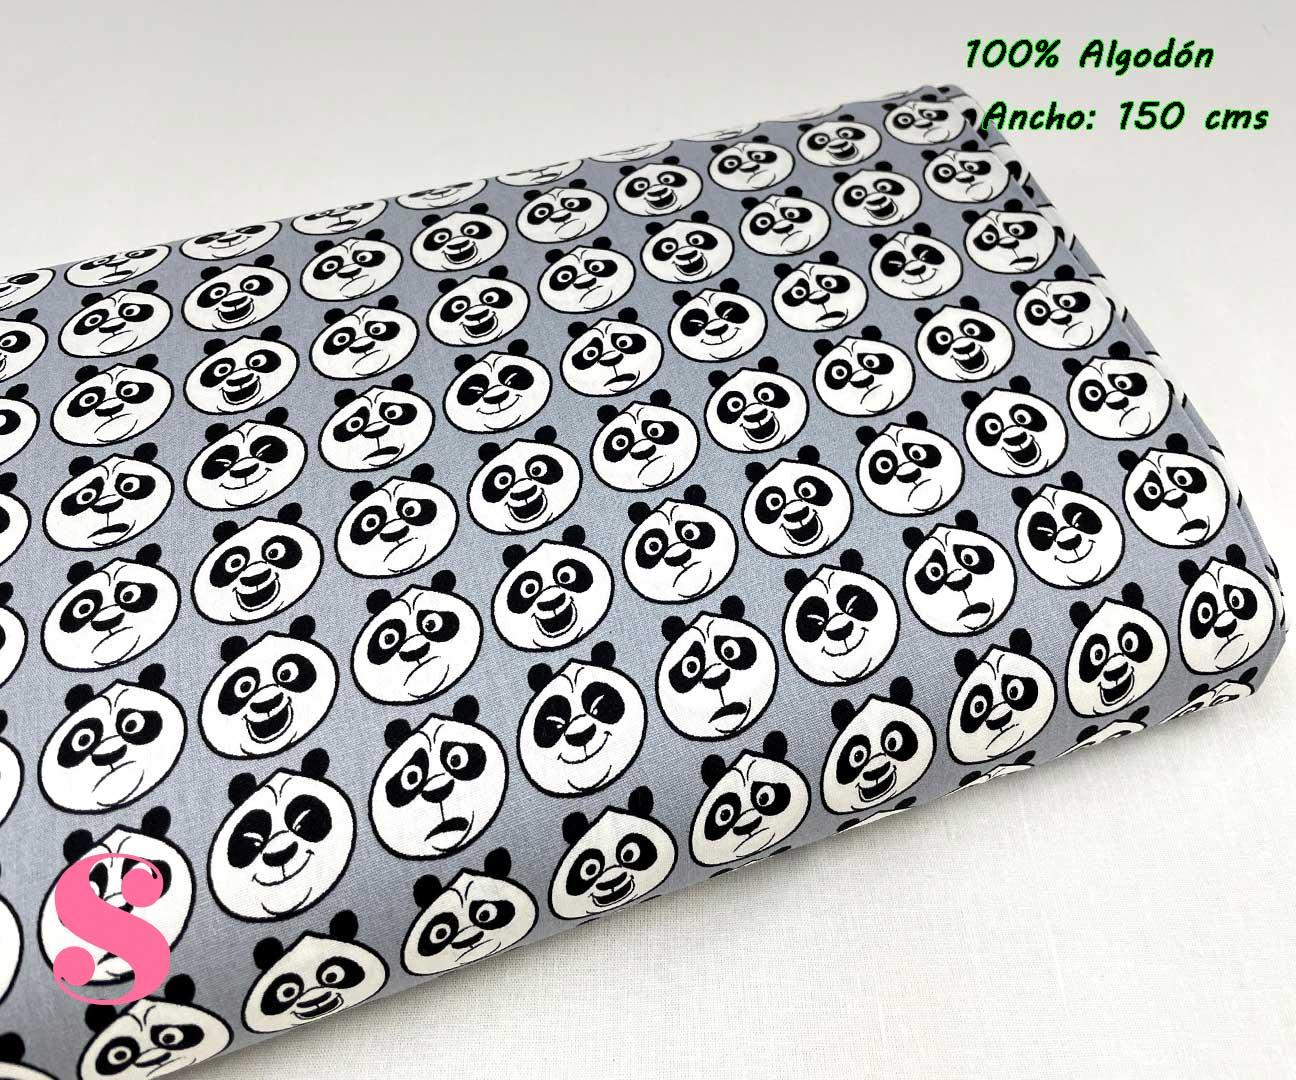 39-tela-estampada-kung-fu-panda,telas-dibujos-animados-frikis,telas-infantiles,tejidos-infantiles,Tejido Estampado Kung Fu Panda Caras